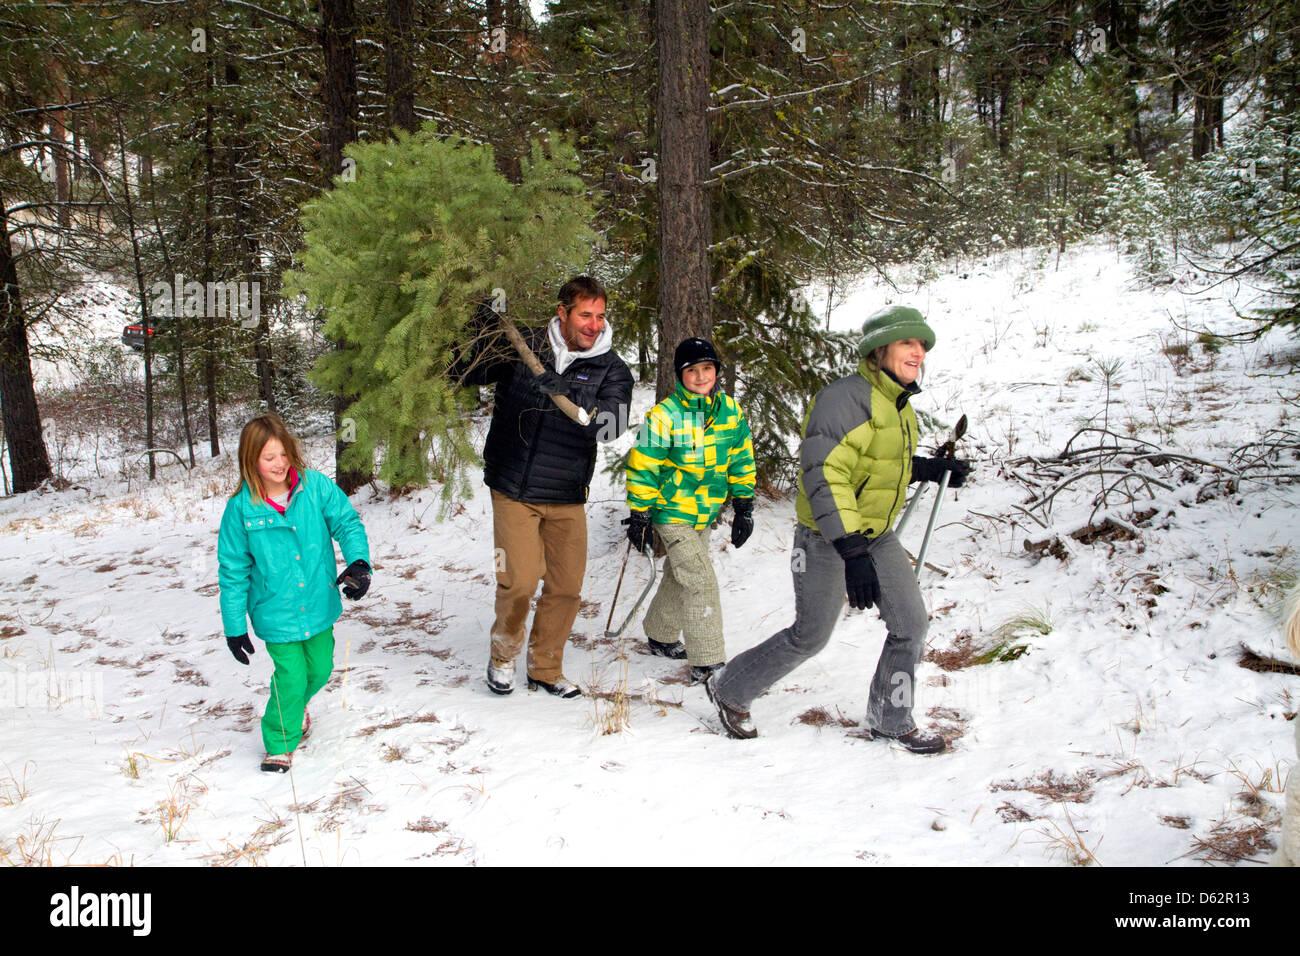 Family cutting a Christmas tree in the Boise National Forest near Idaho City, Idaho, USA. - Stock Image